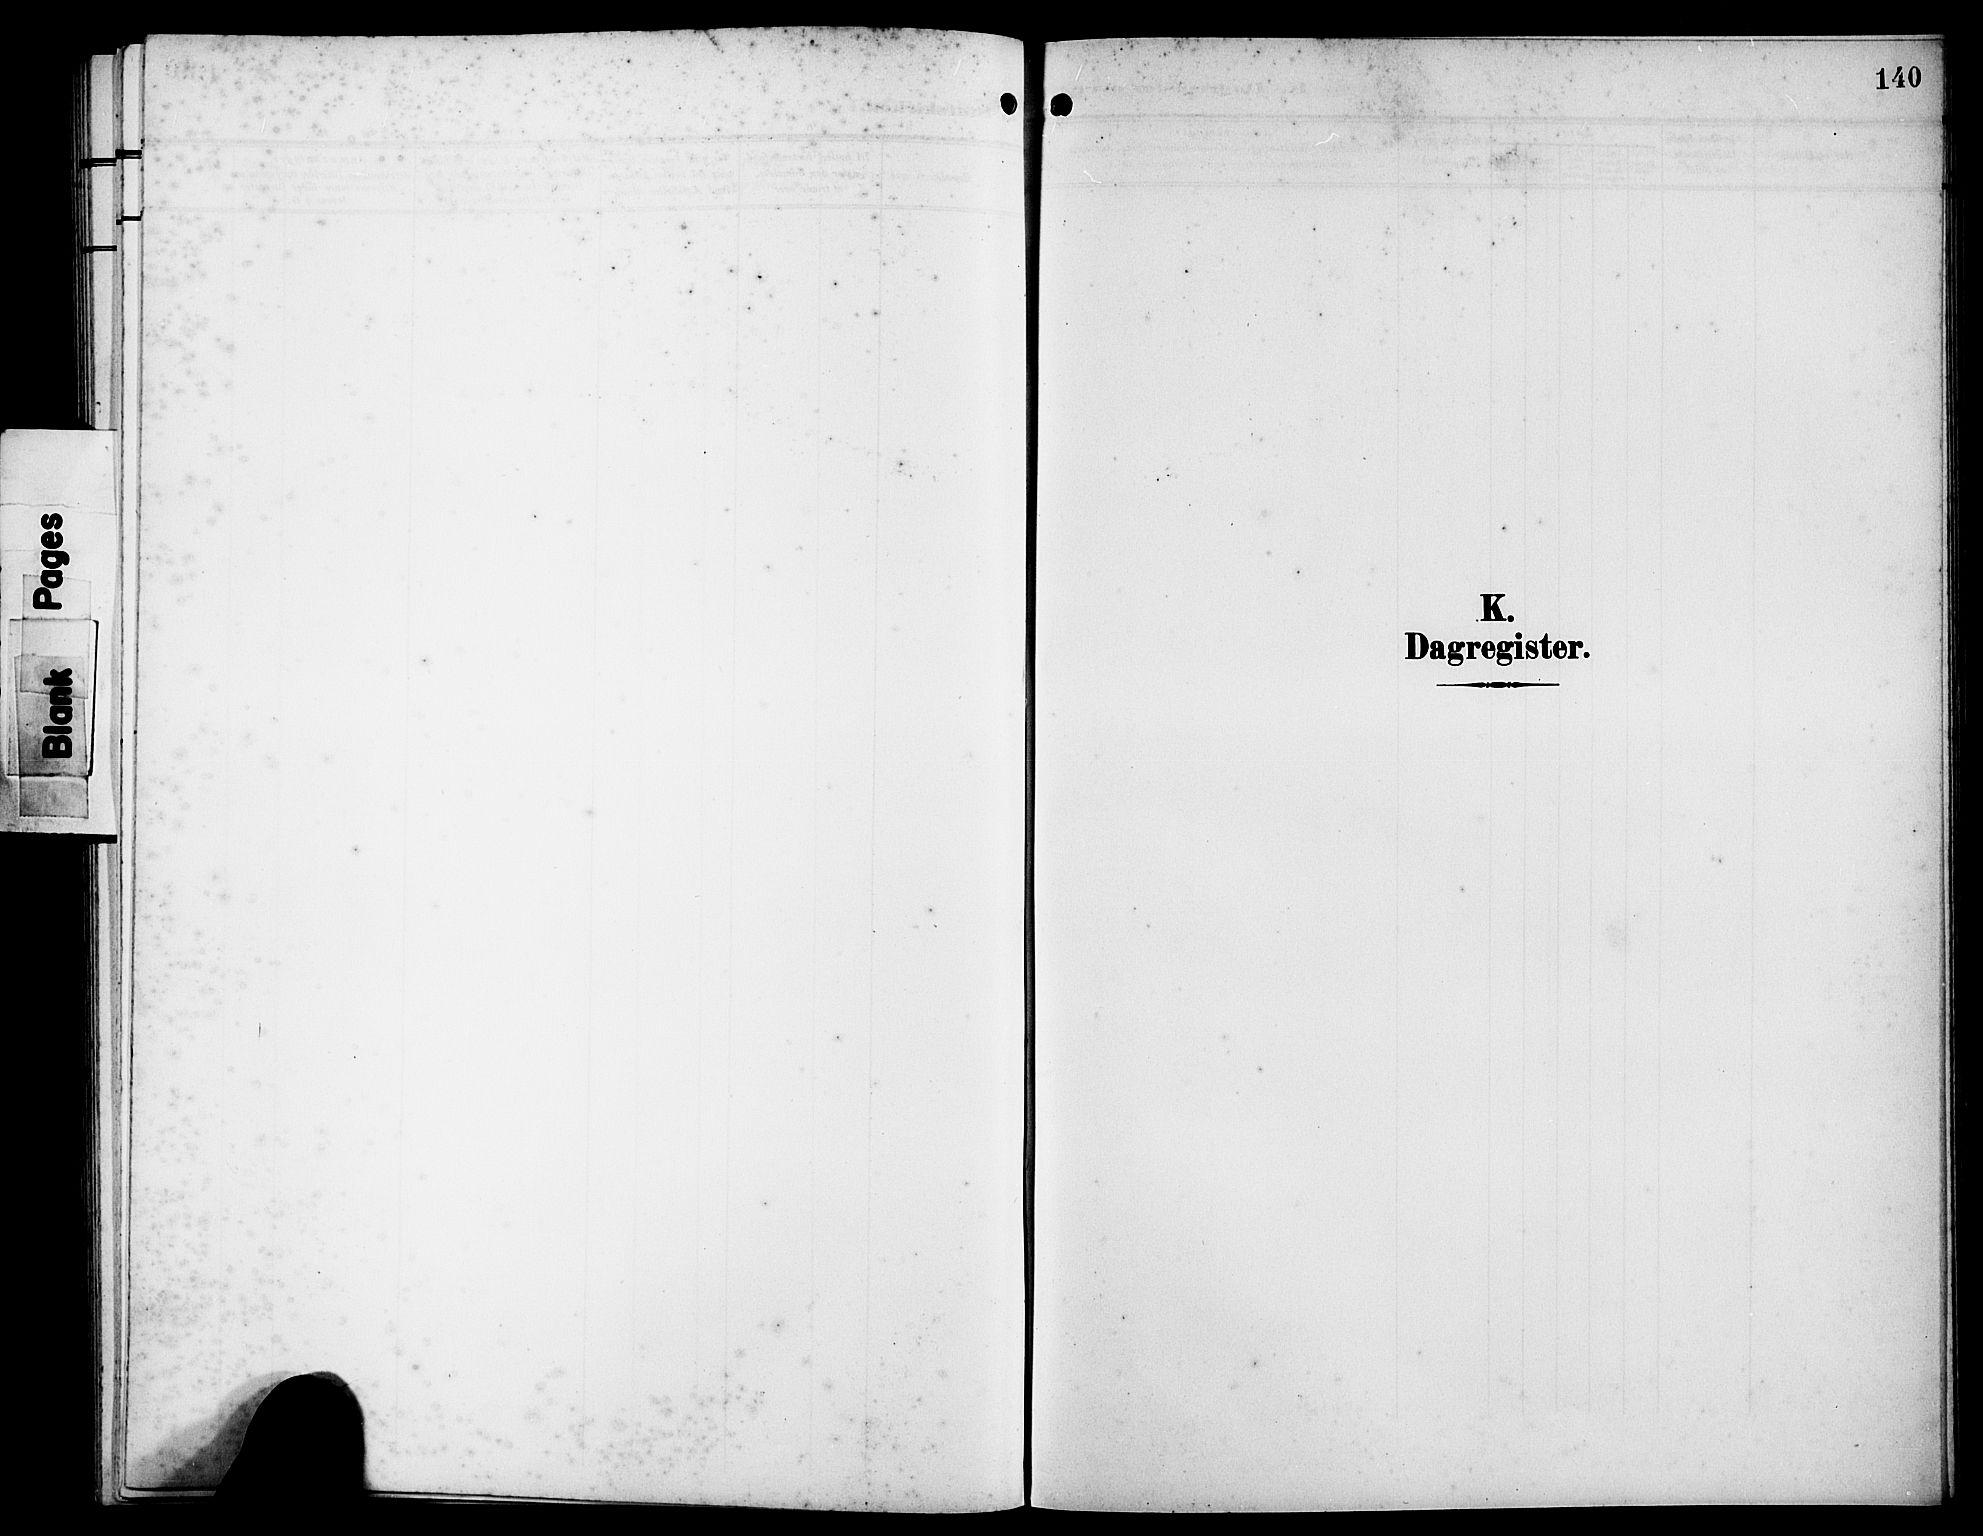 SAB, Bremanger Sokneprestembete, H/Hab: Klokkerbok nr. B 1, 1906-1925, s. 140